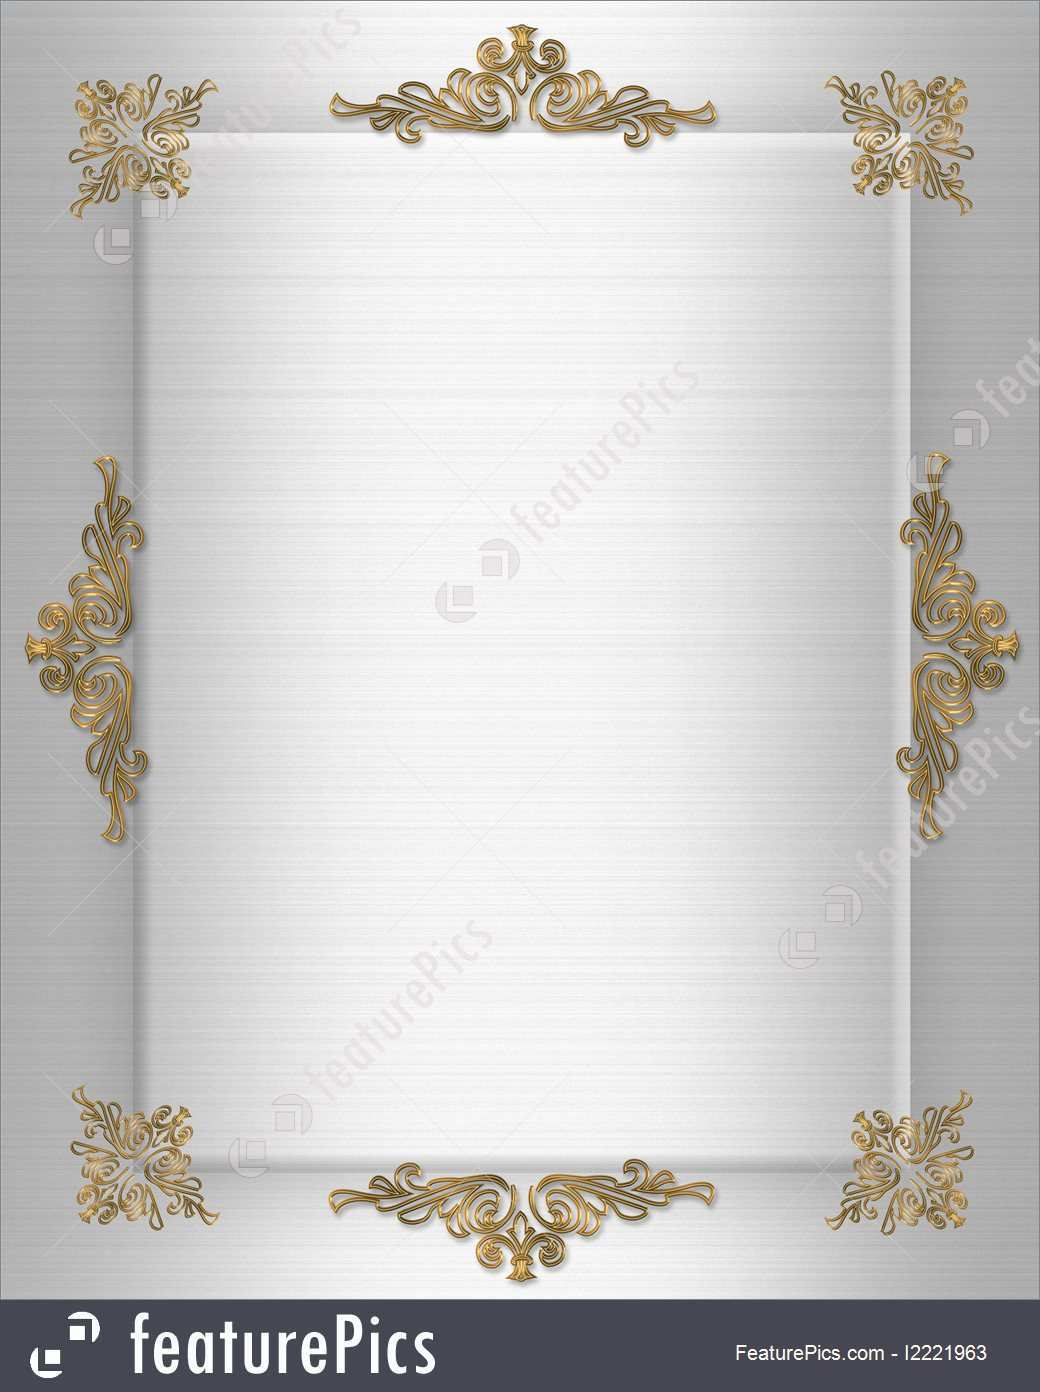 26 How To Create Elegant Wedding Invitation Designs Free For Free by Elegant Wedding Invitation Designs Free